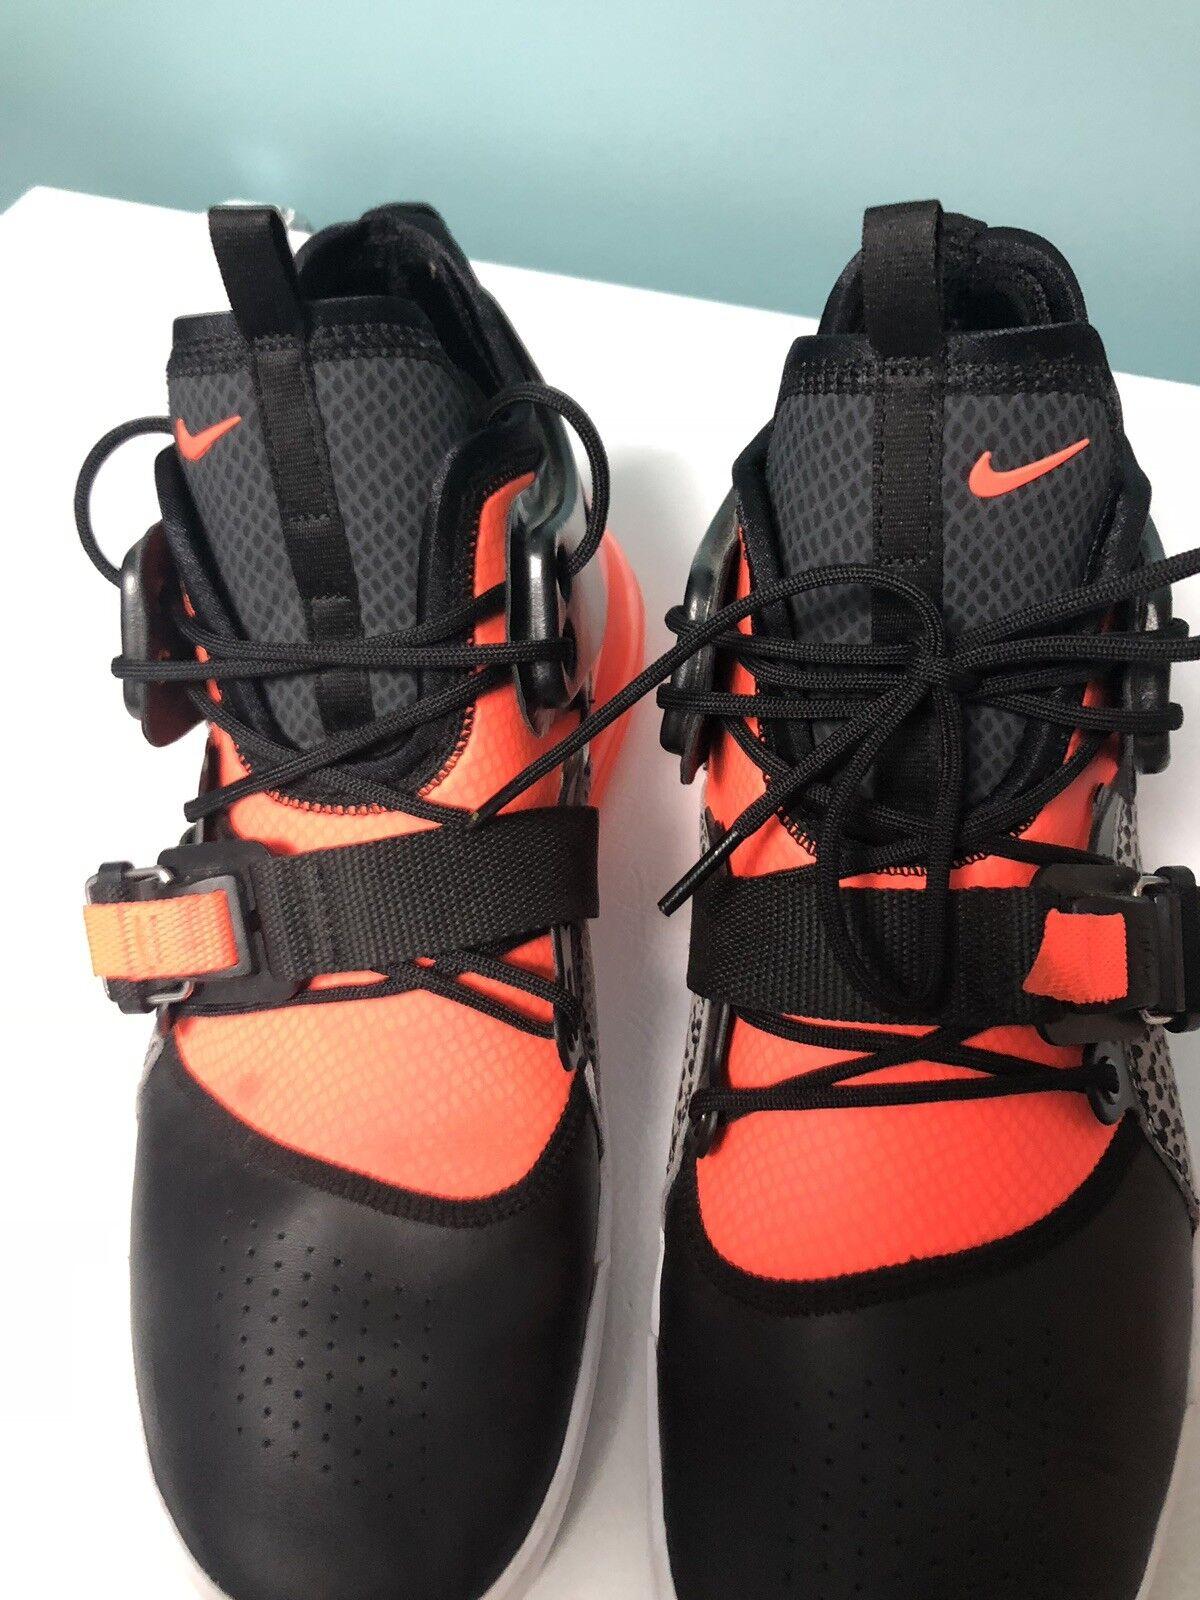 nike air Noir force 270 Noir air  orange   baskets taille 11,5 rare nous aa406c